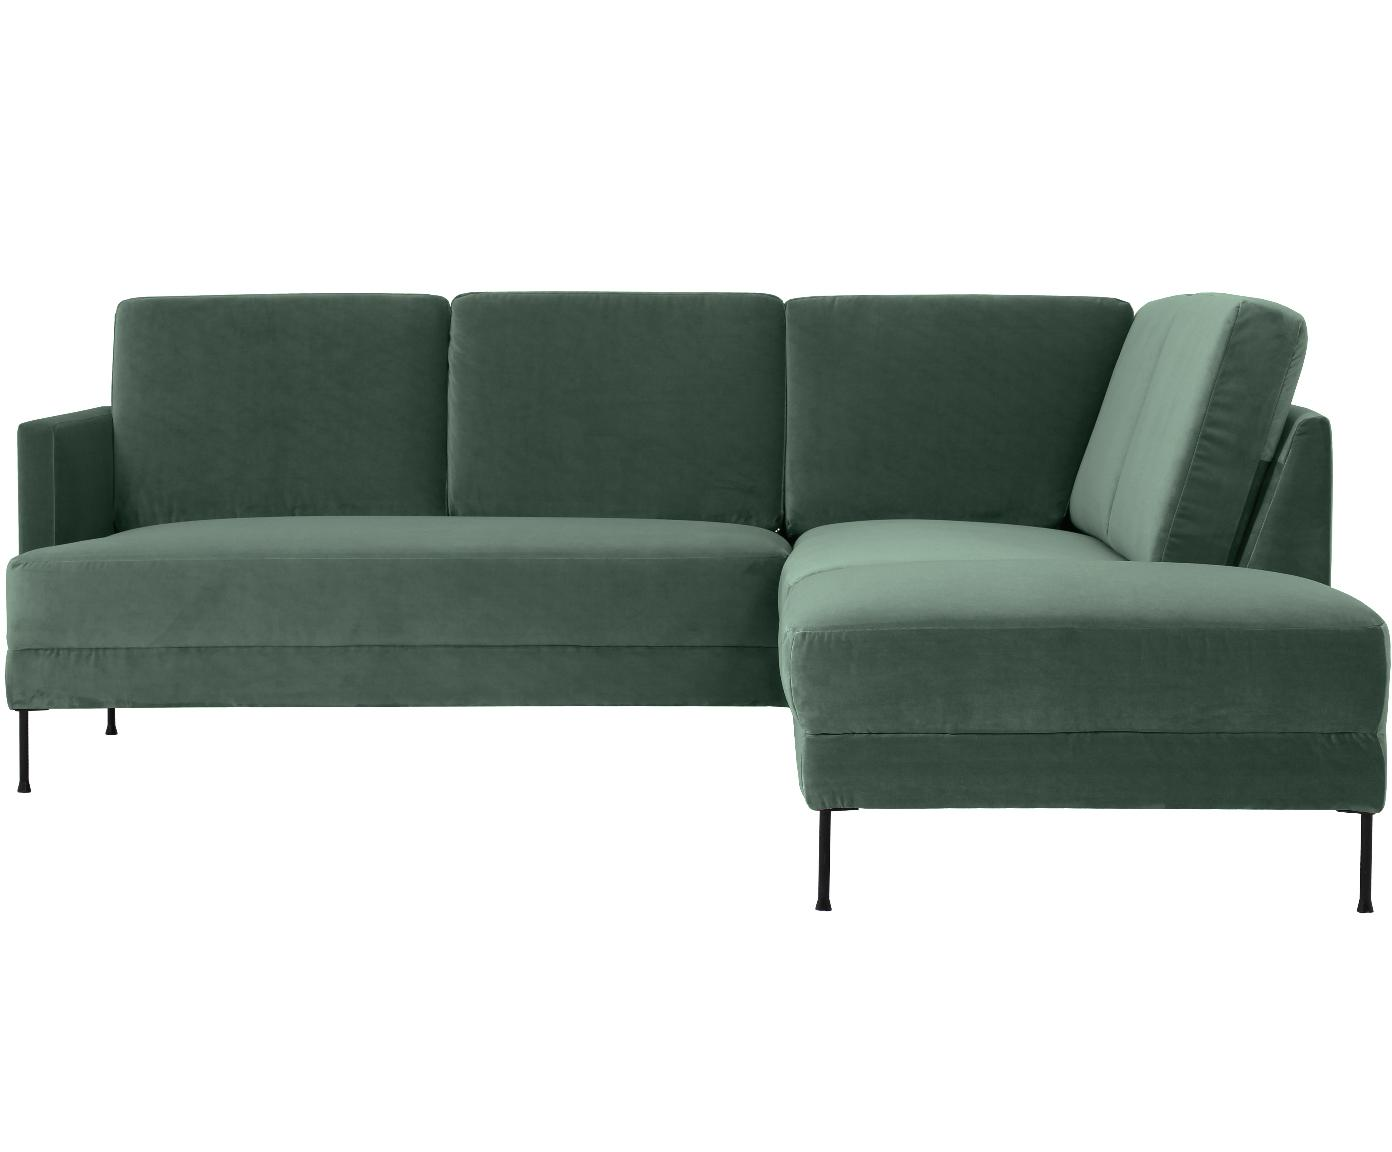 Fluwelen hoekbank Fluente, Bekleding: fluweel (hoogwaardig poly, Frame: massief grenenhout, Poten: gelakt metaal, Groen, B 221 x D 200 cm